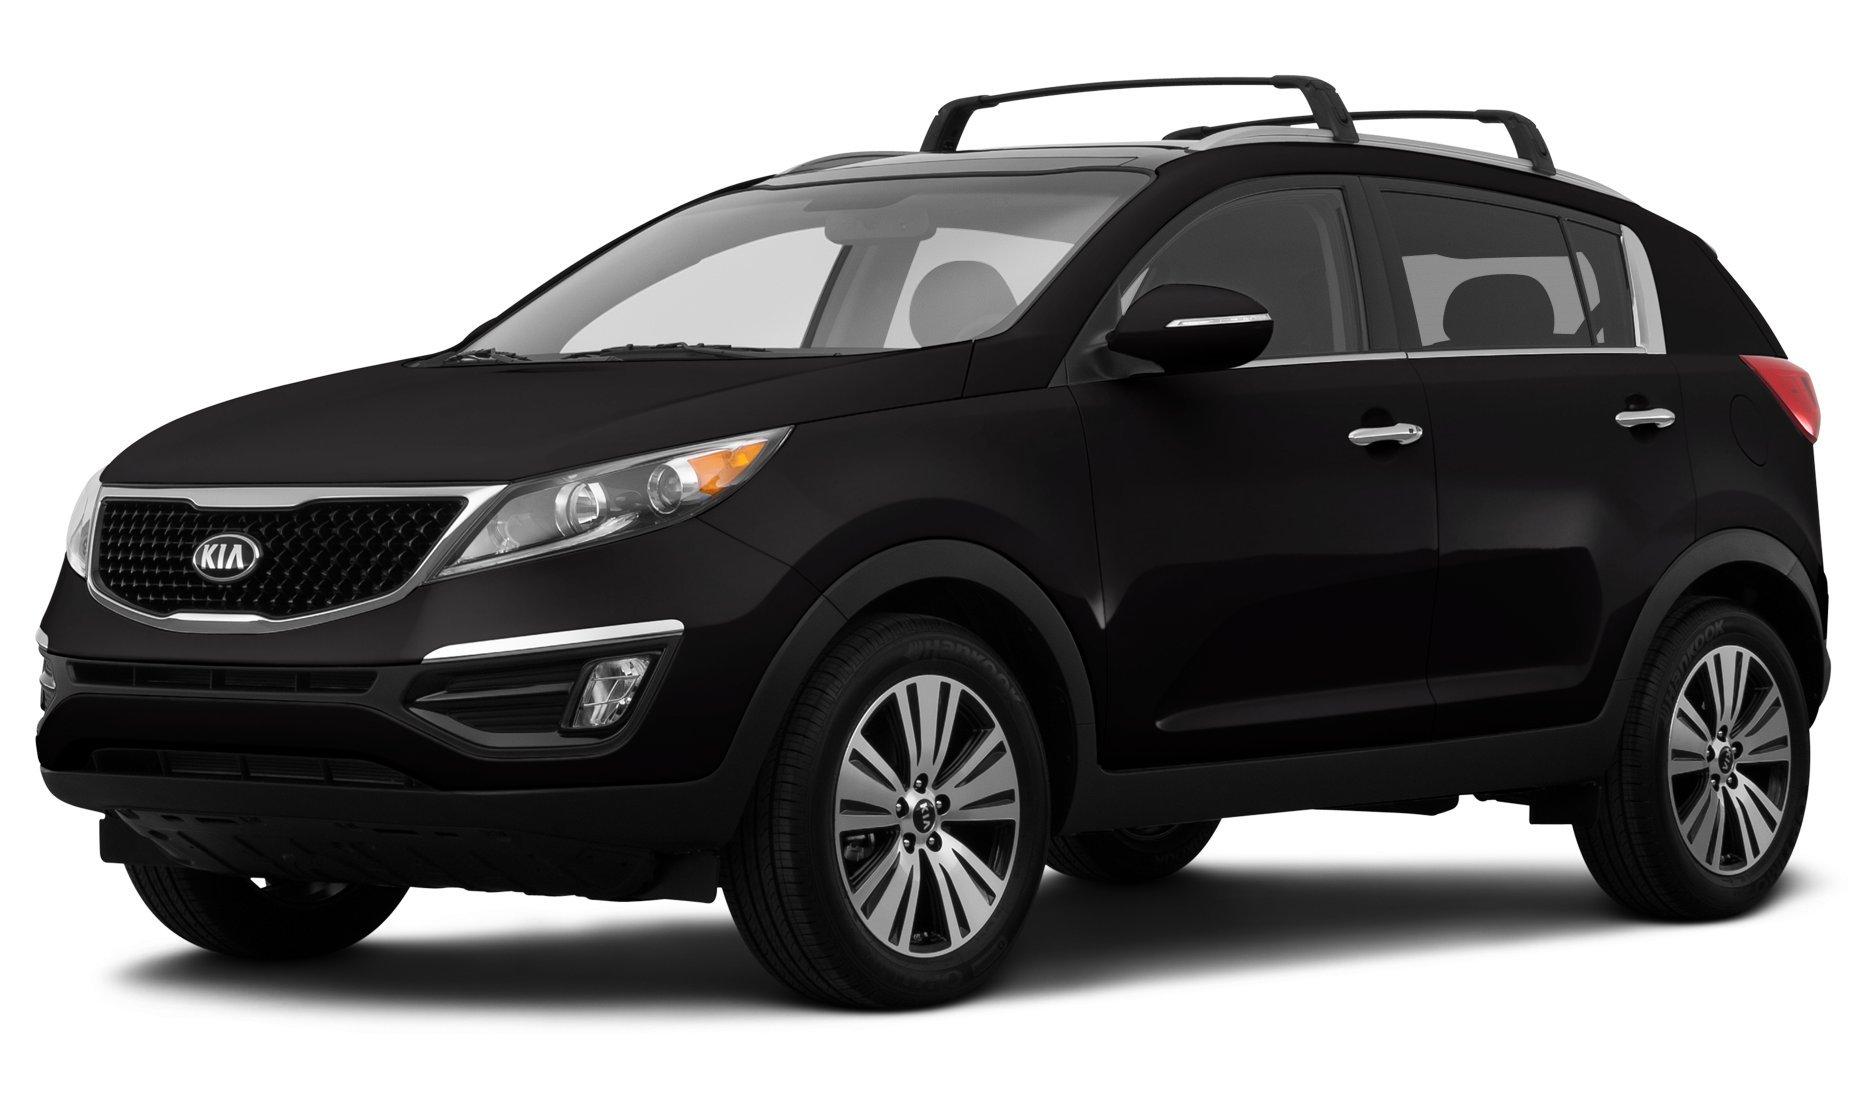 מדהים Amazon.com: 2014 Kia Sportage Reviews, Images, and Specs: Vehicles DX-52